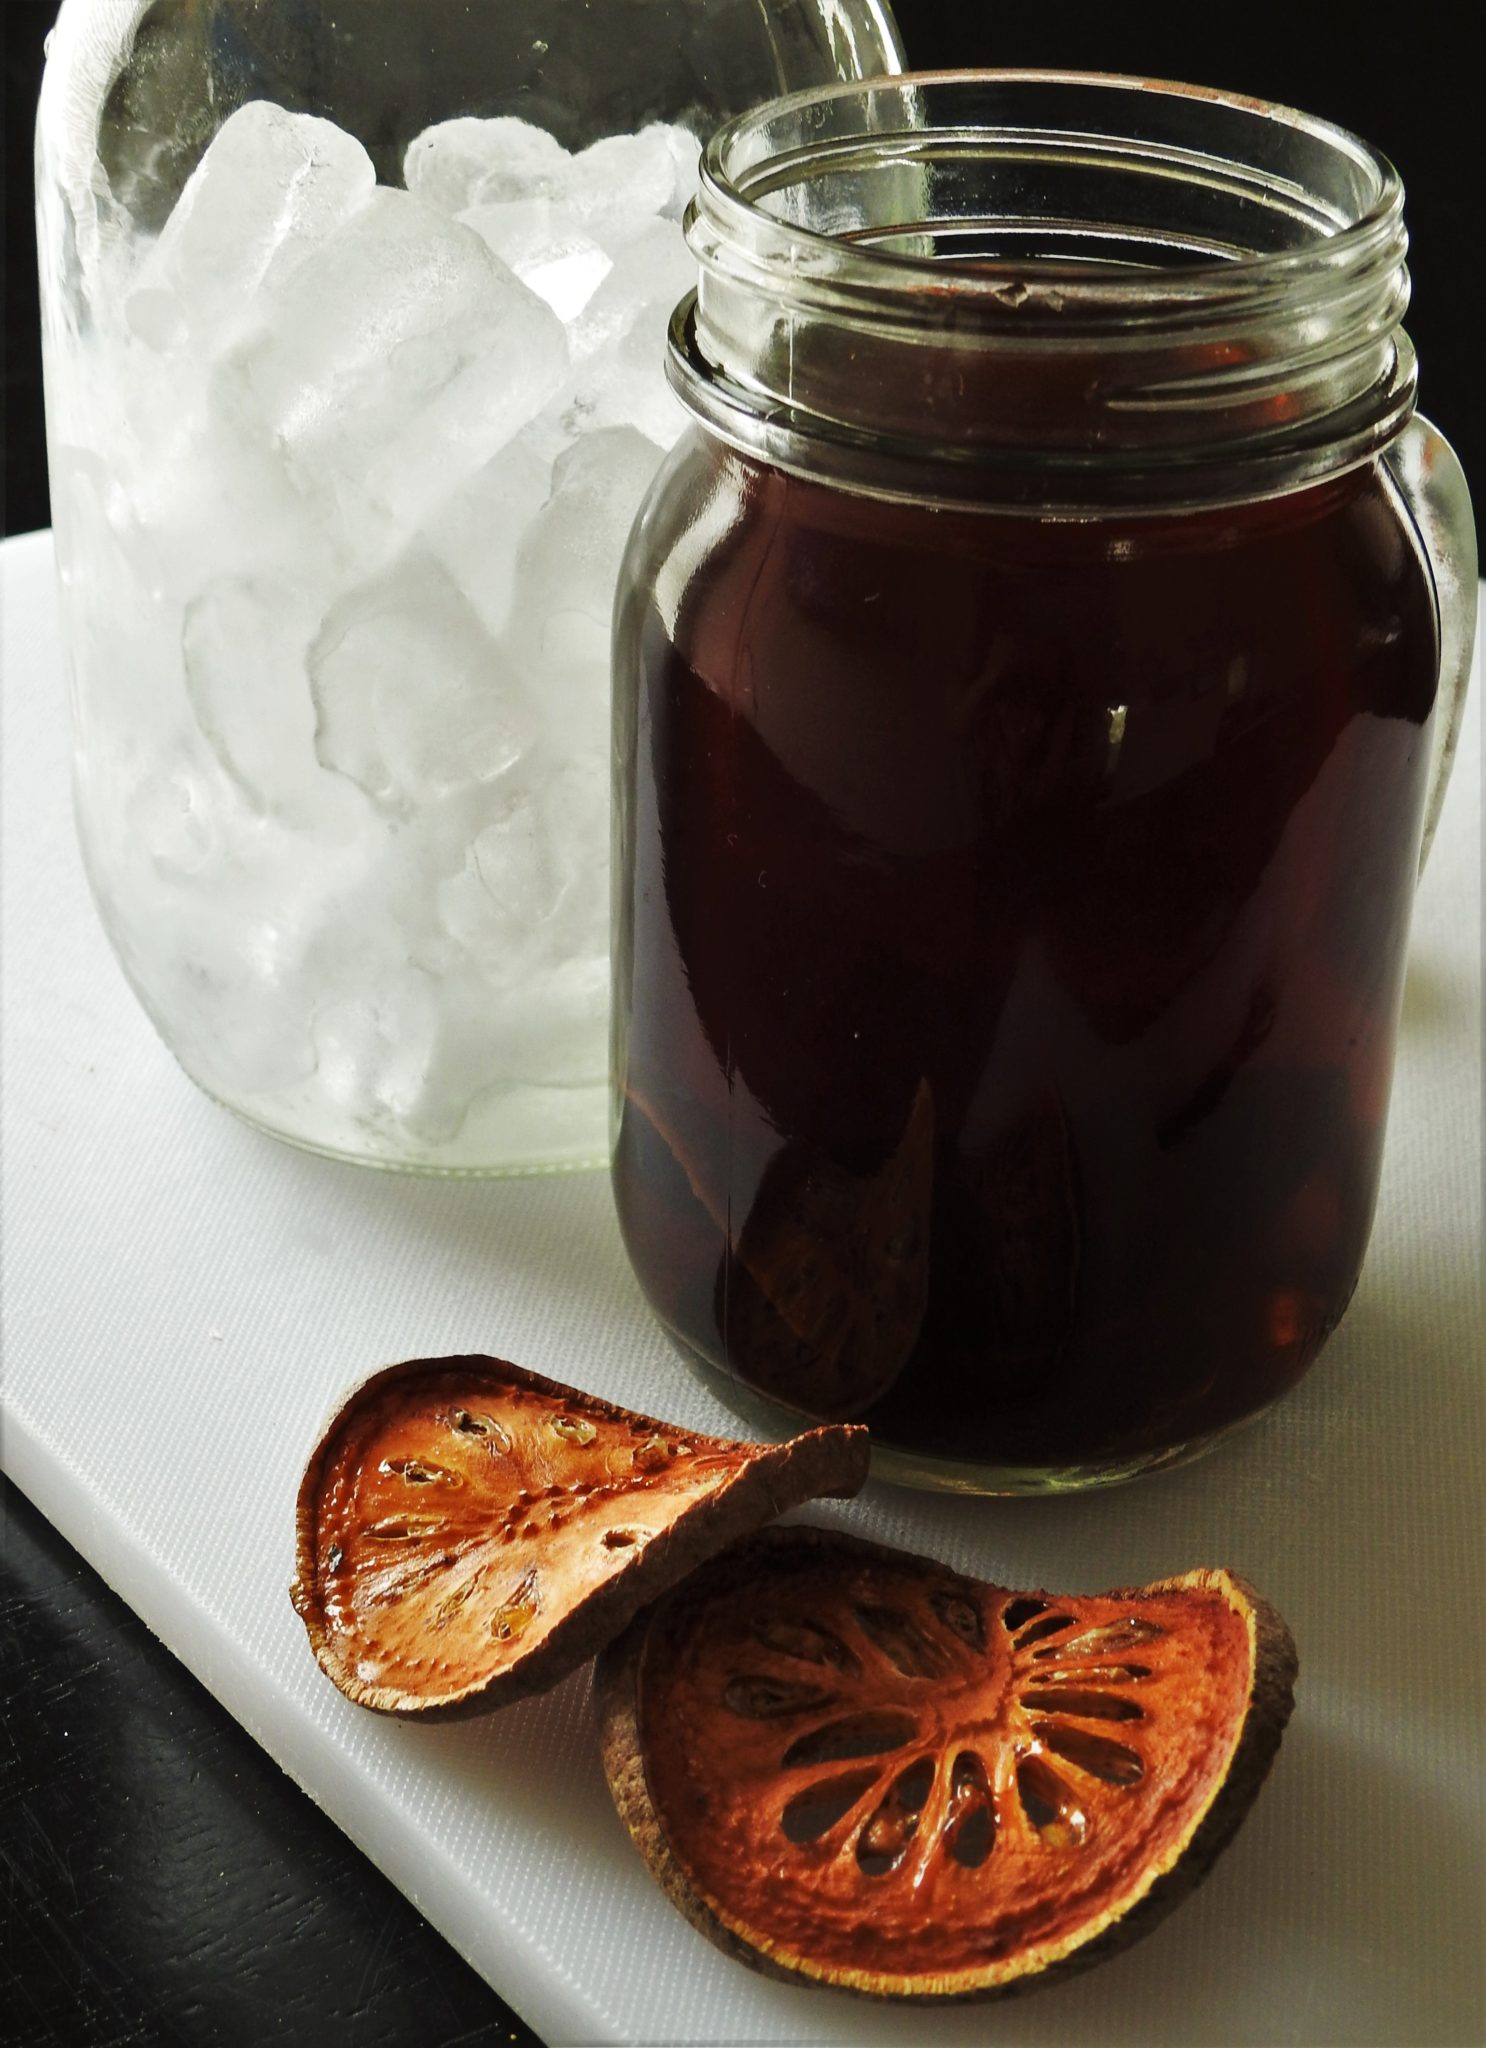 Preparing for Cold Bael Drink